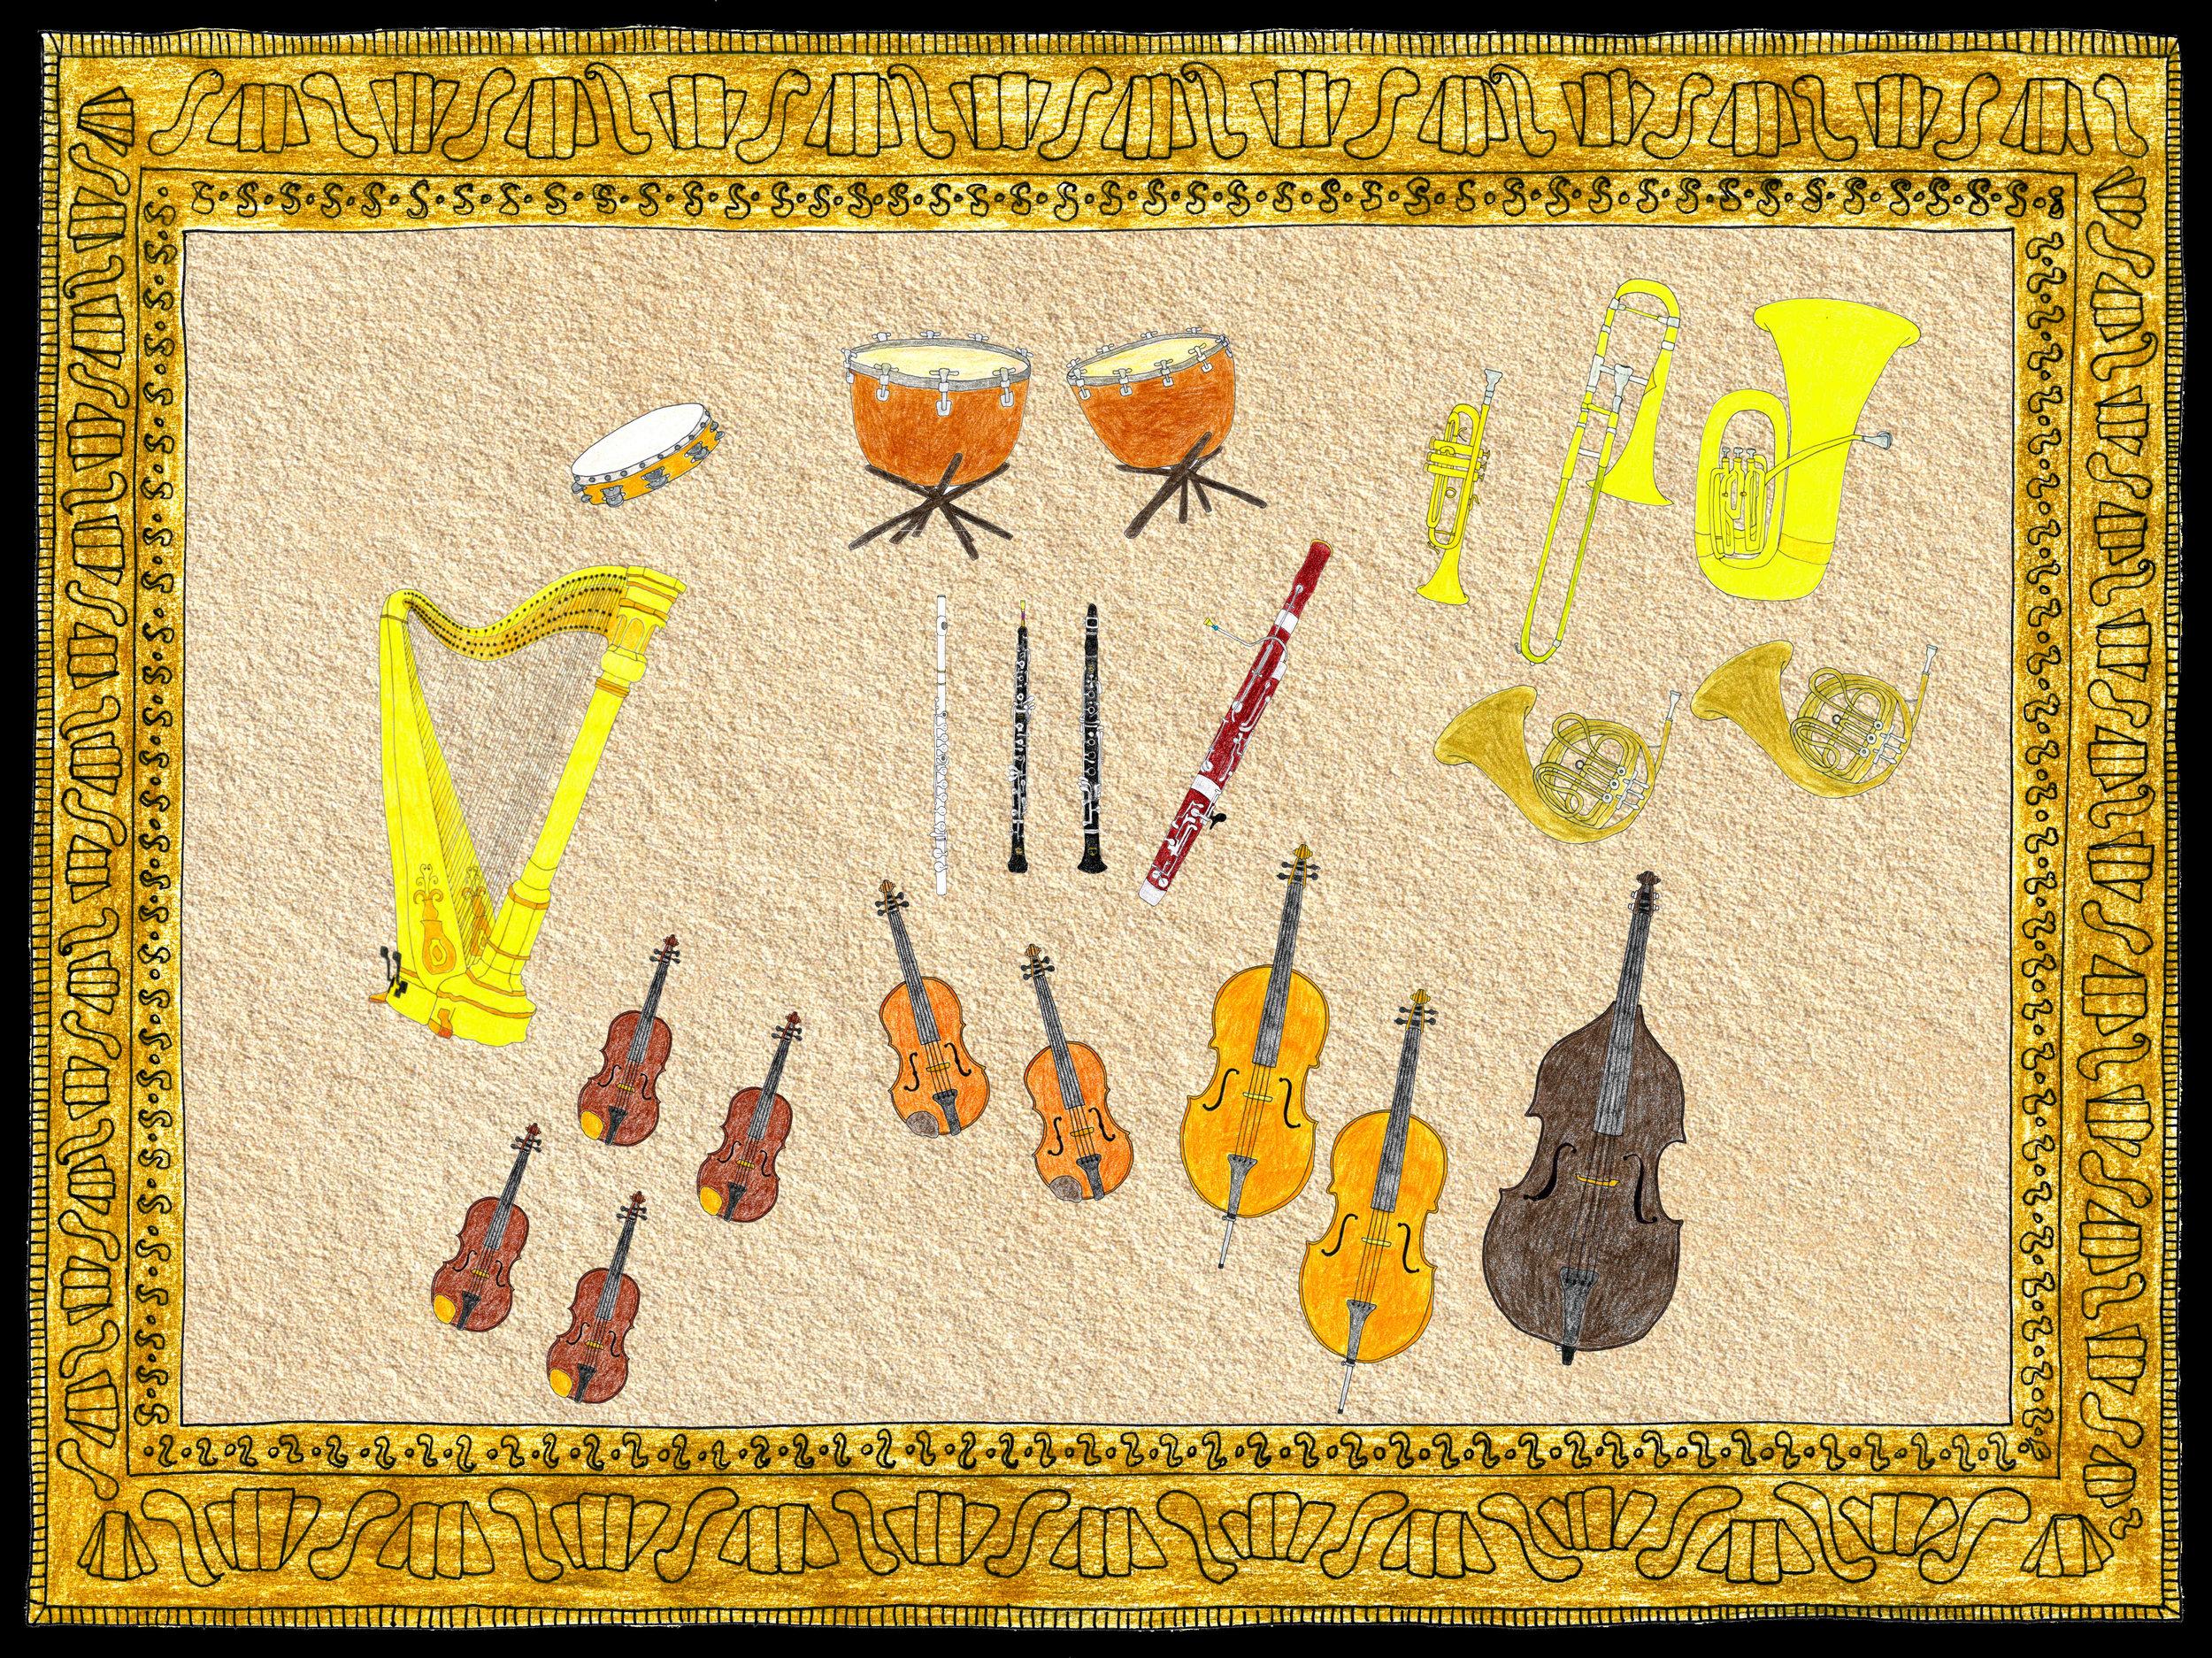 44 orchestra.jpg